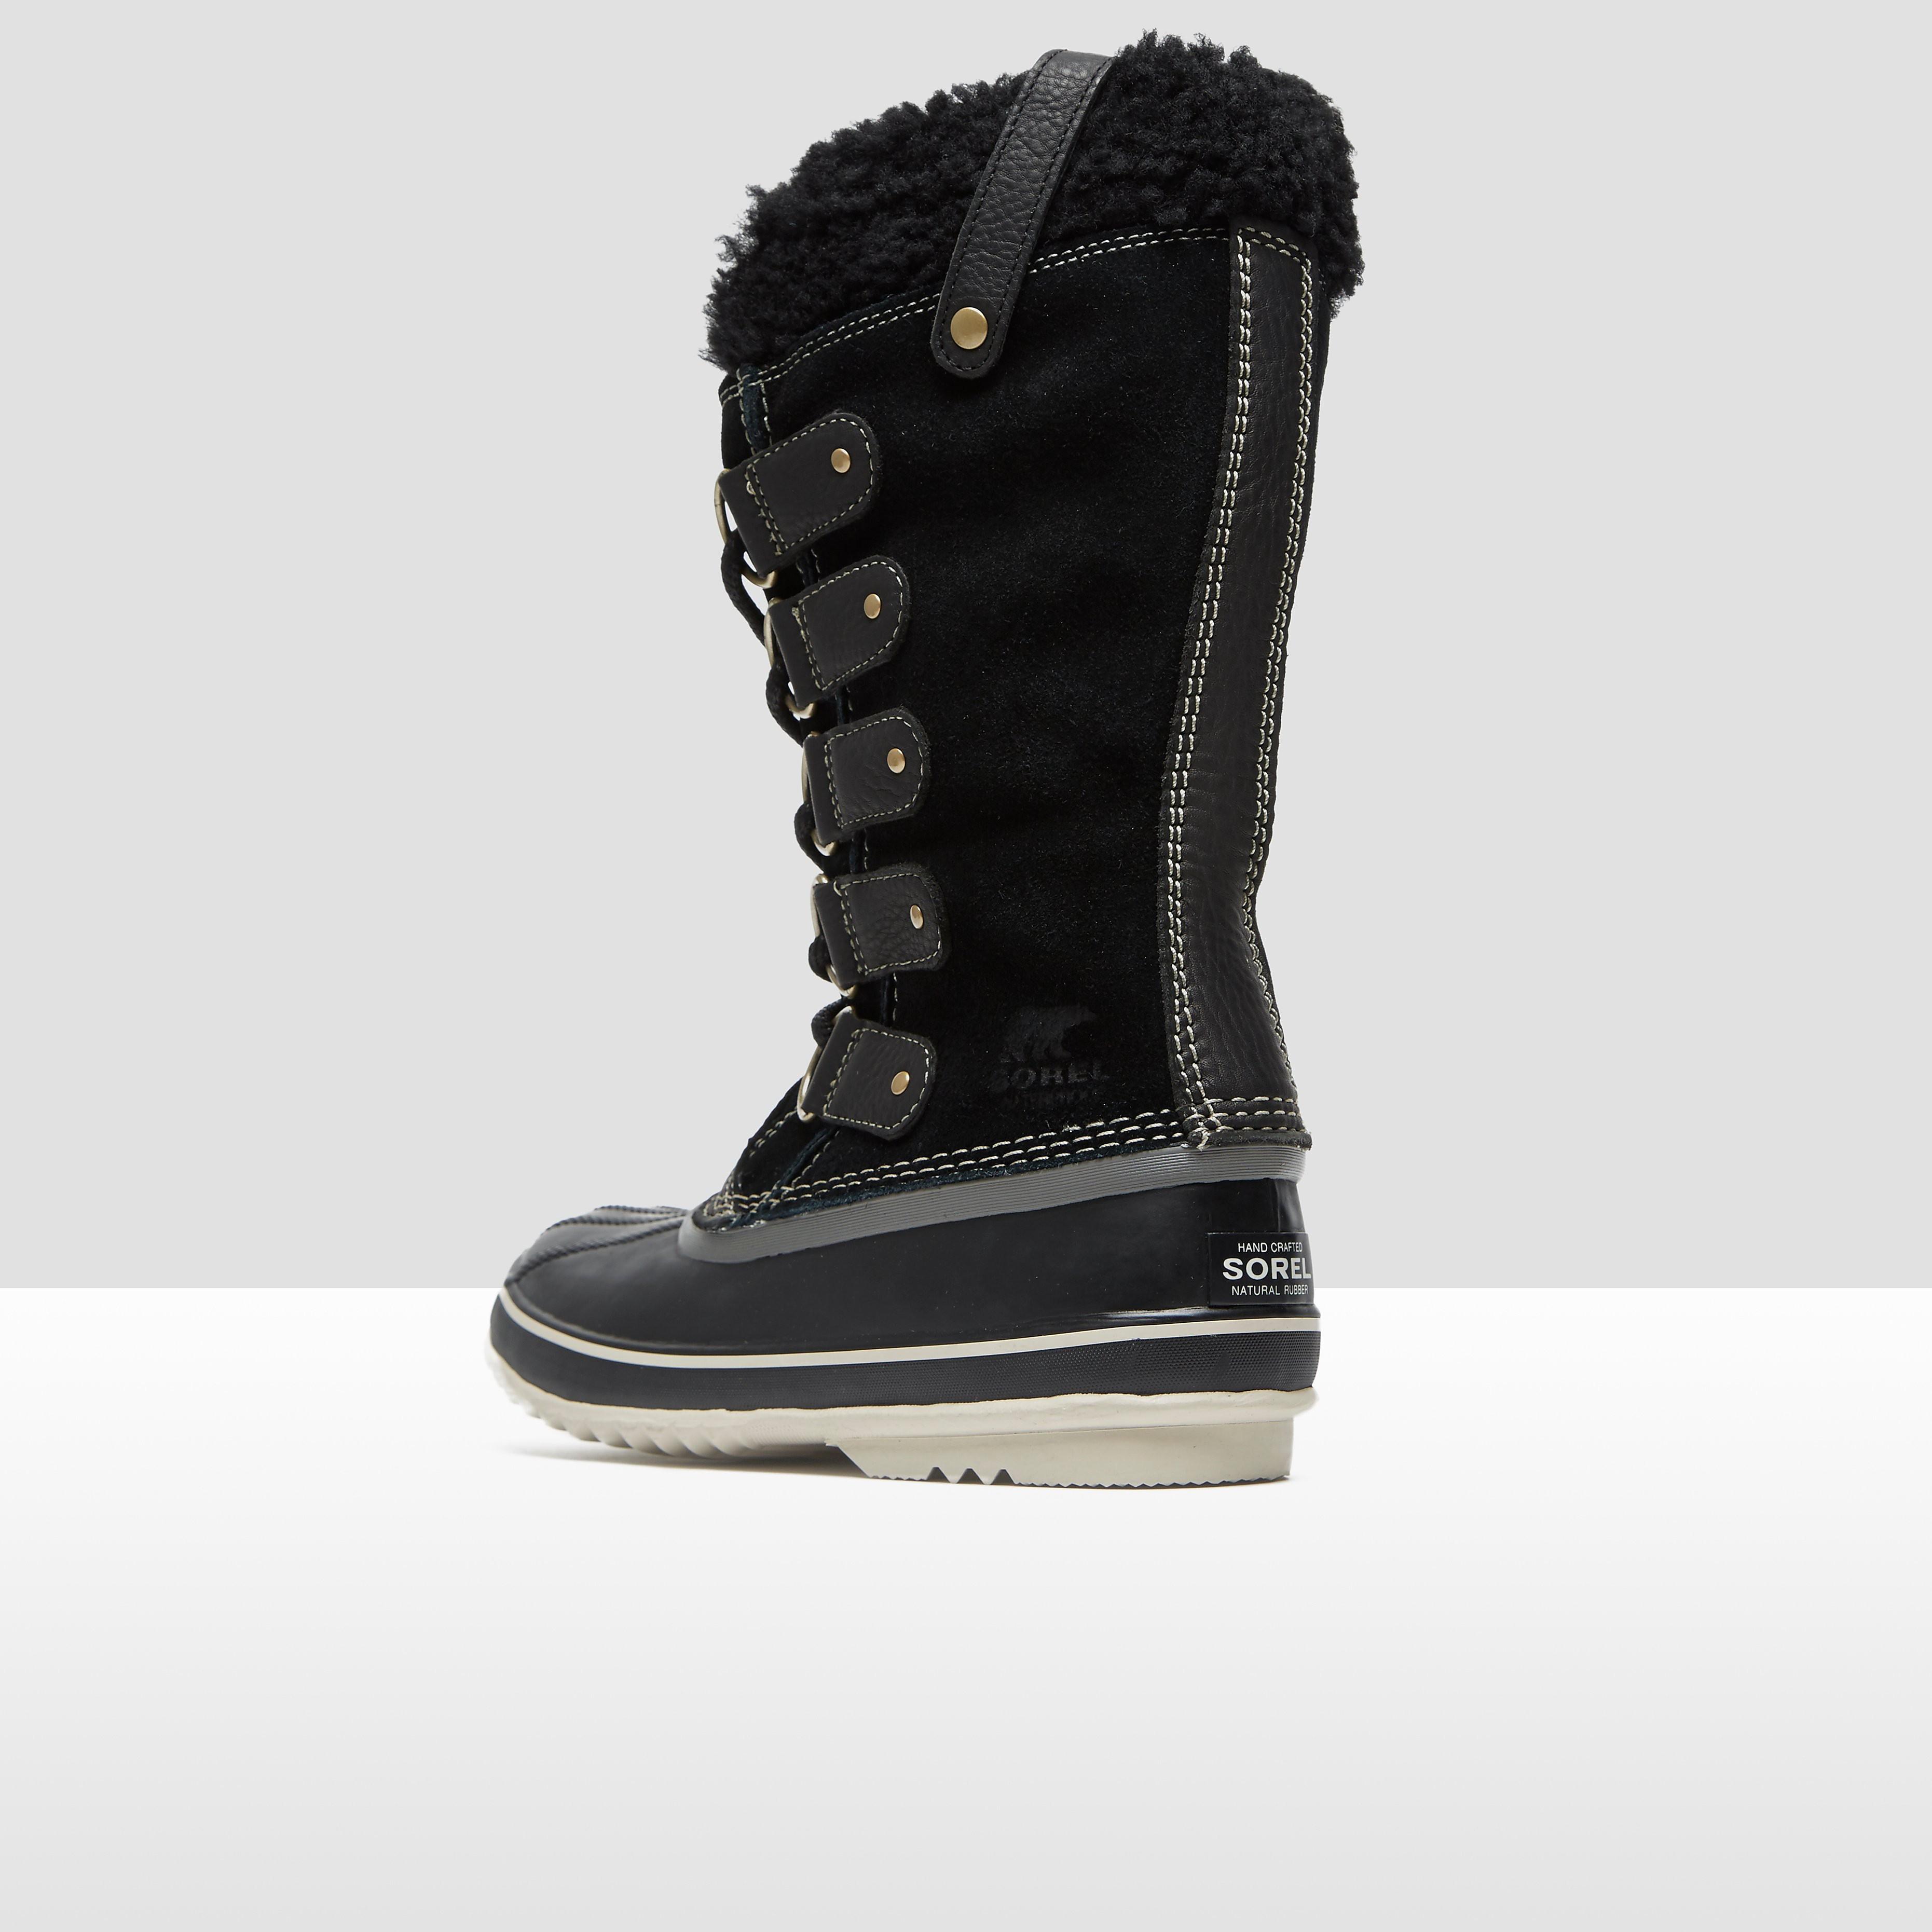 Sorel JOAN OF ARTIC Women's Winter Boots